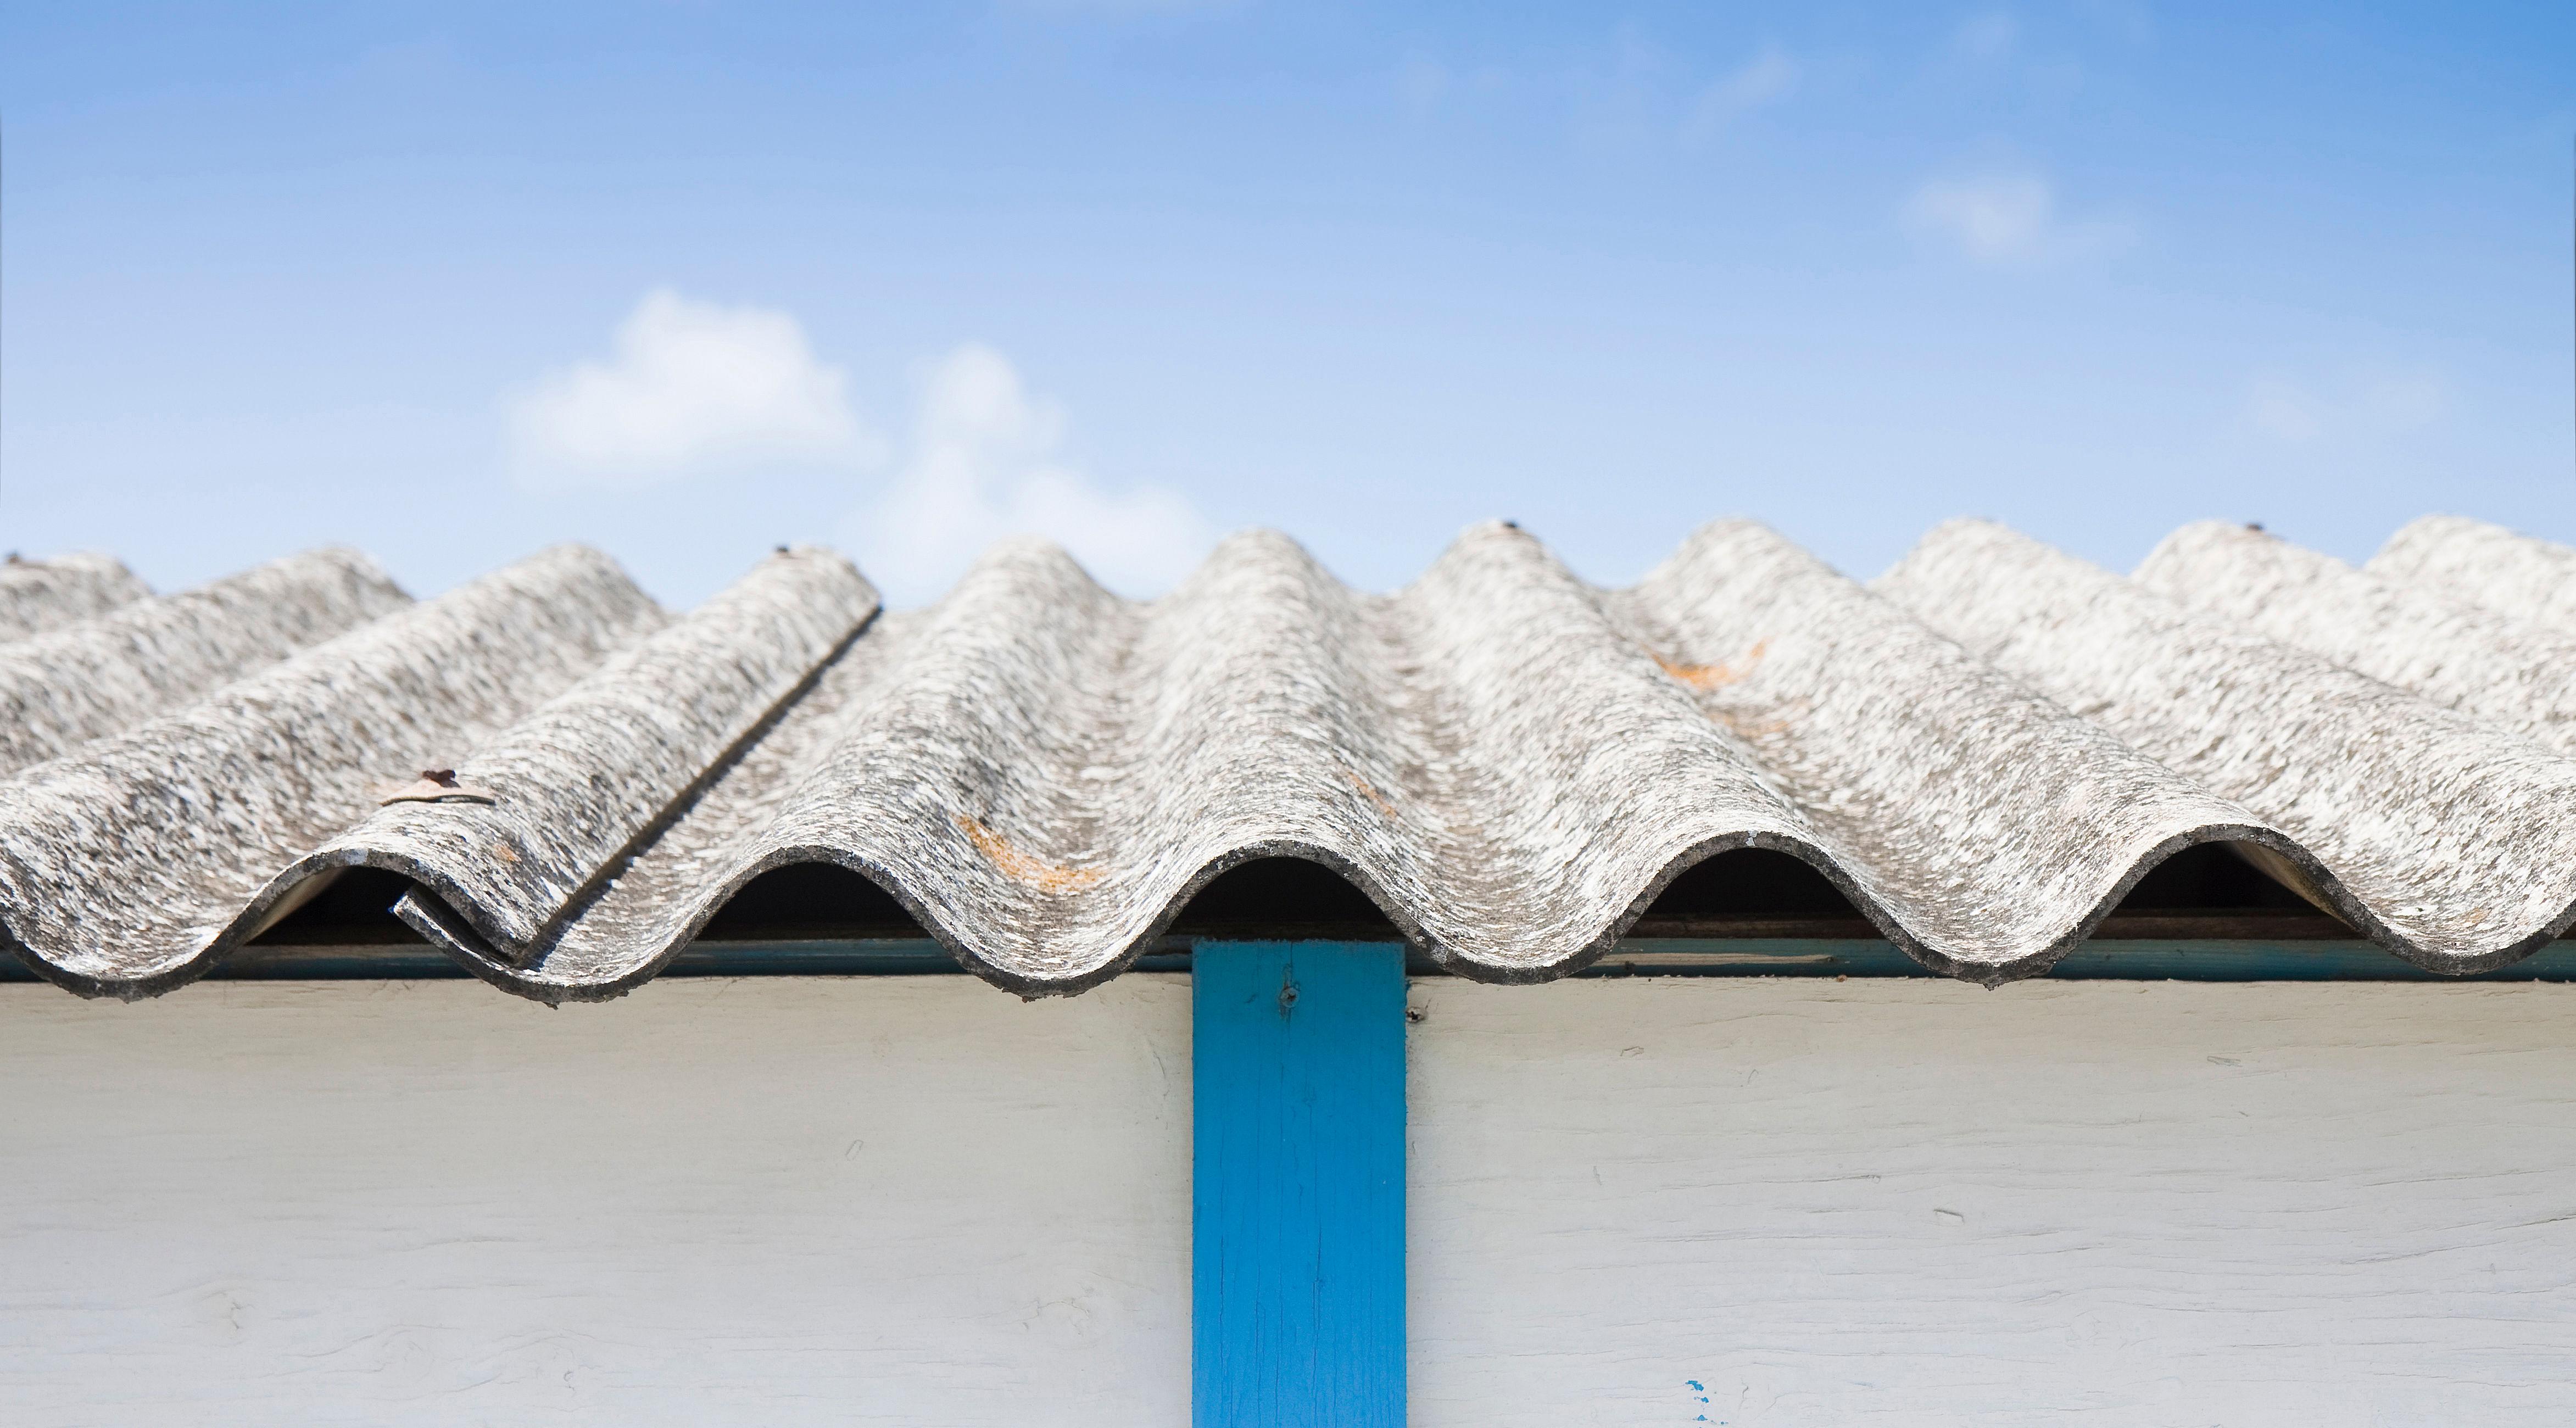 Asbestos on garage roof